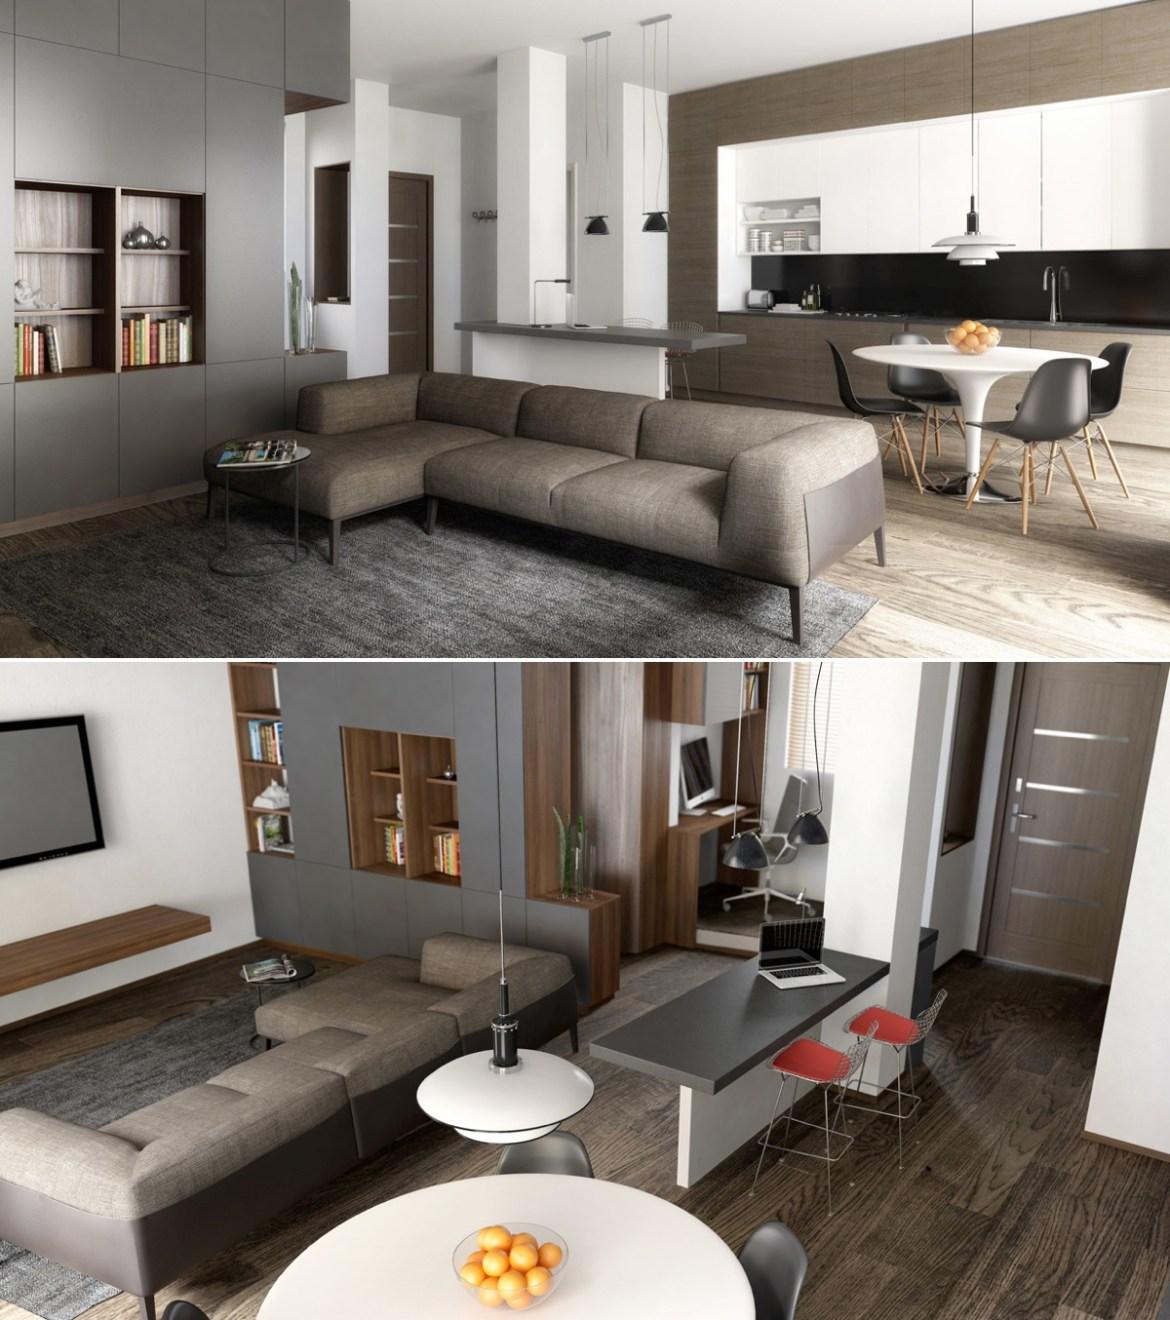 neutral-decor-ideas